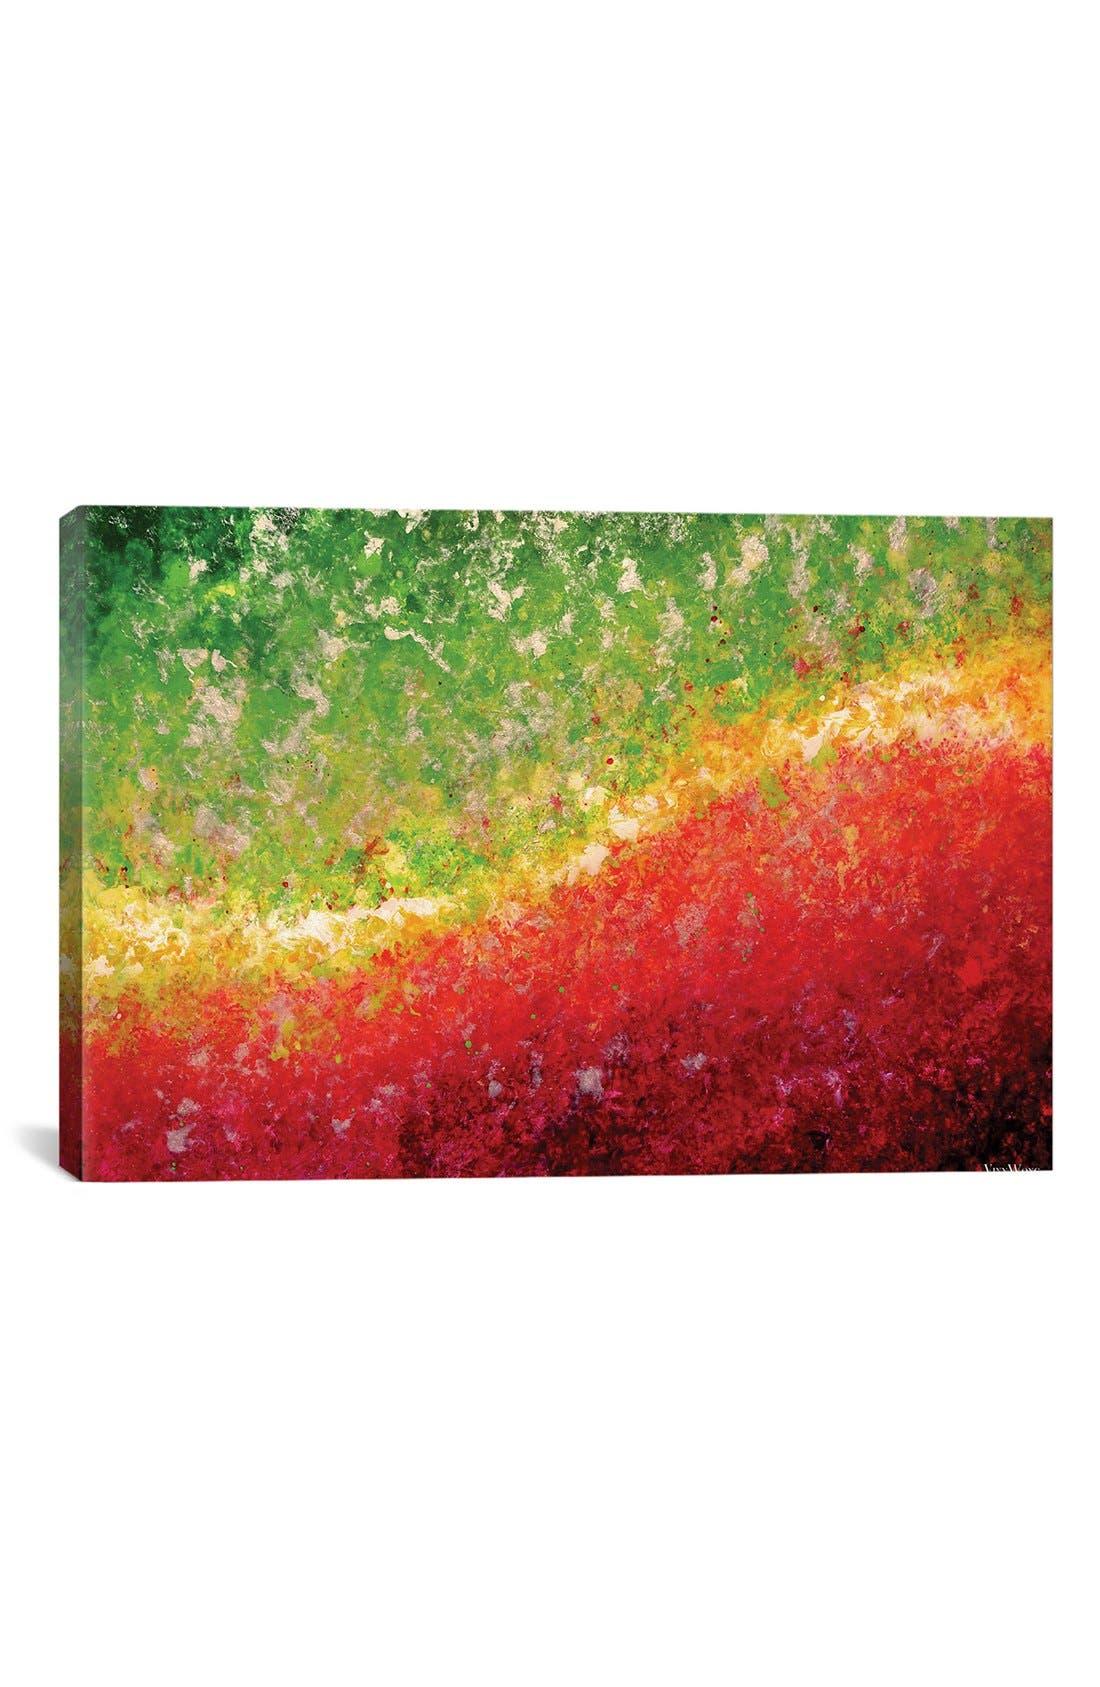 'Equinox' Giclée Print Canvas Art,                         Main,                         color, GREEN